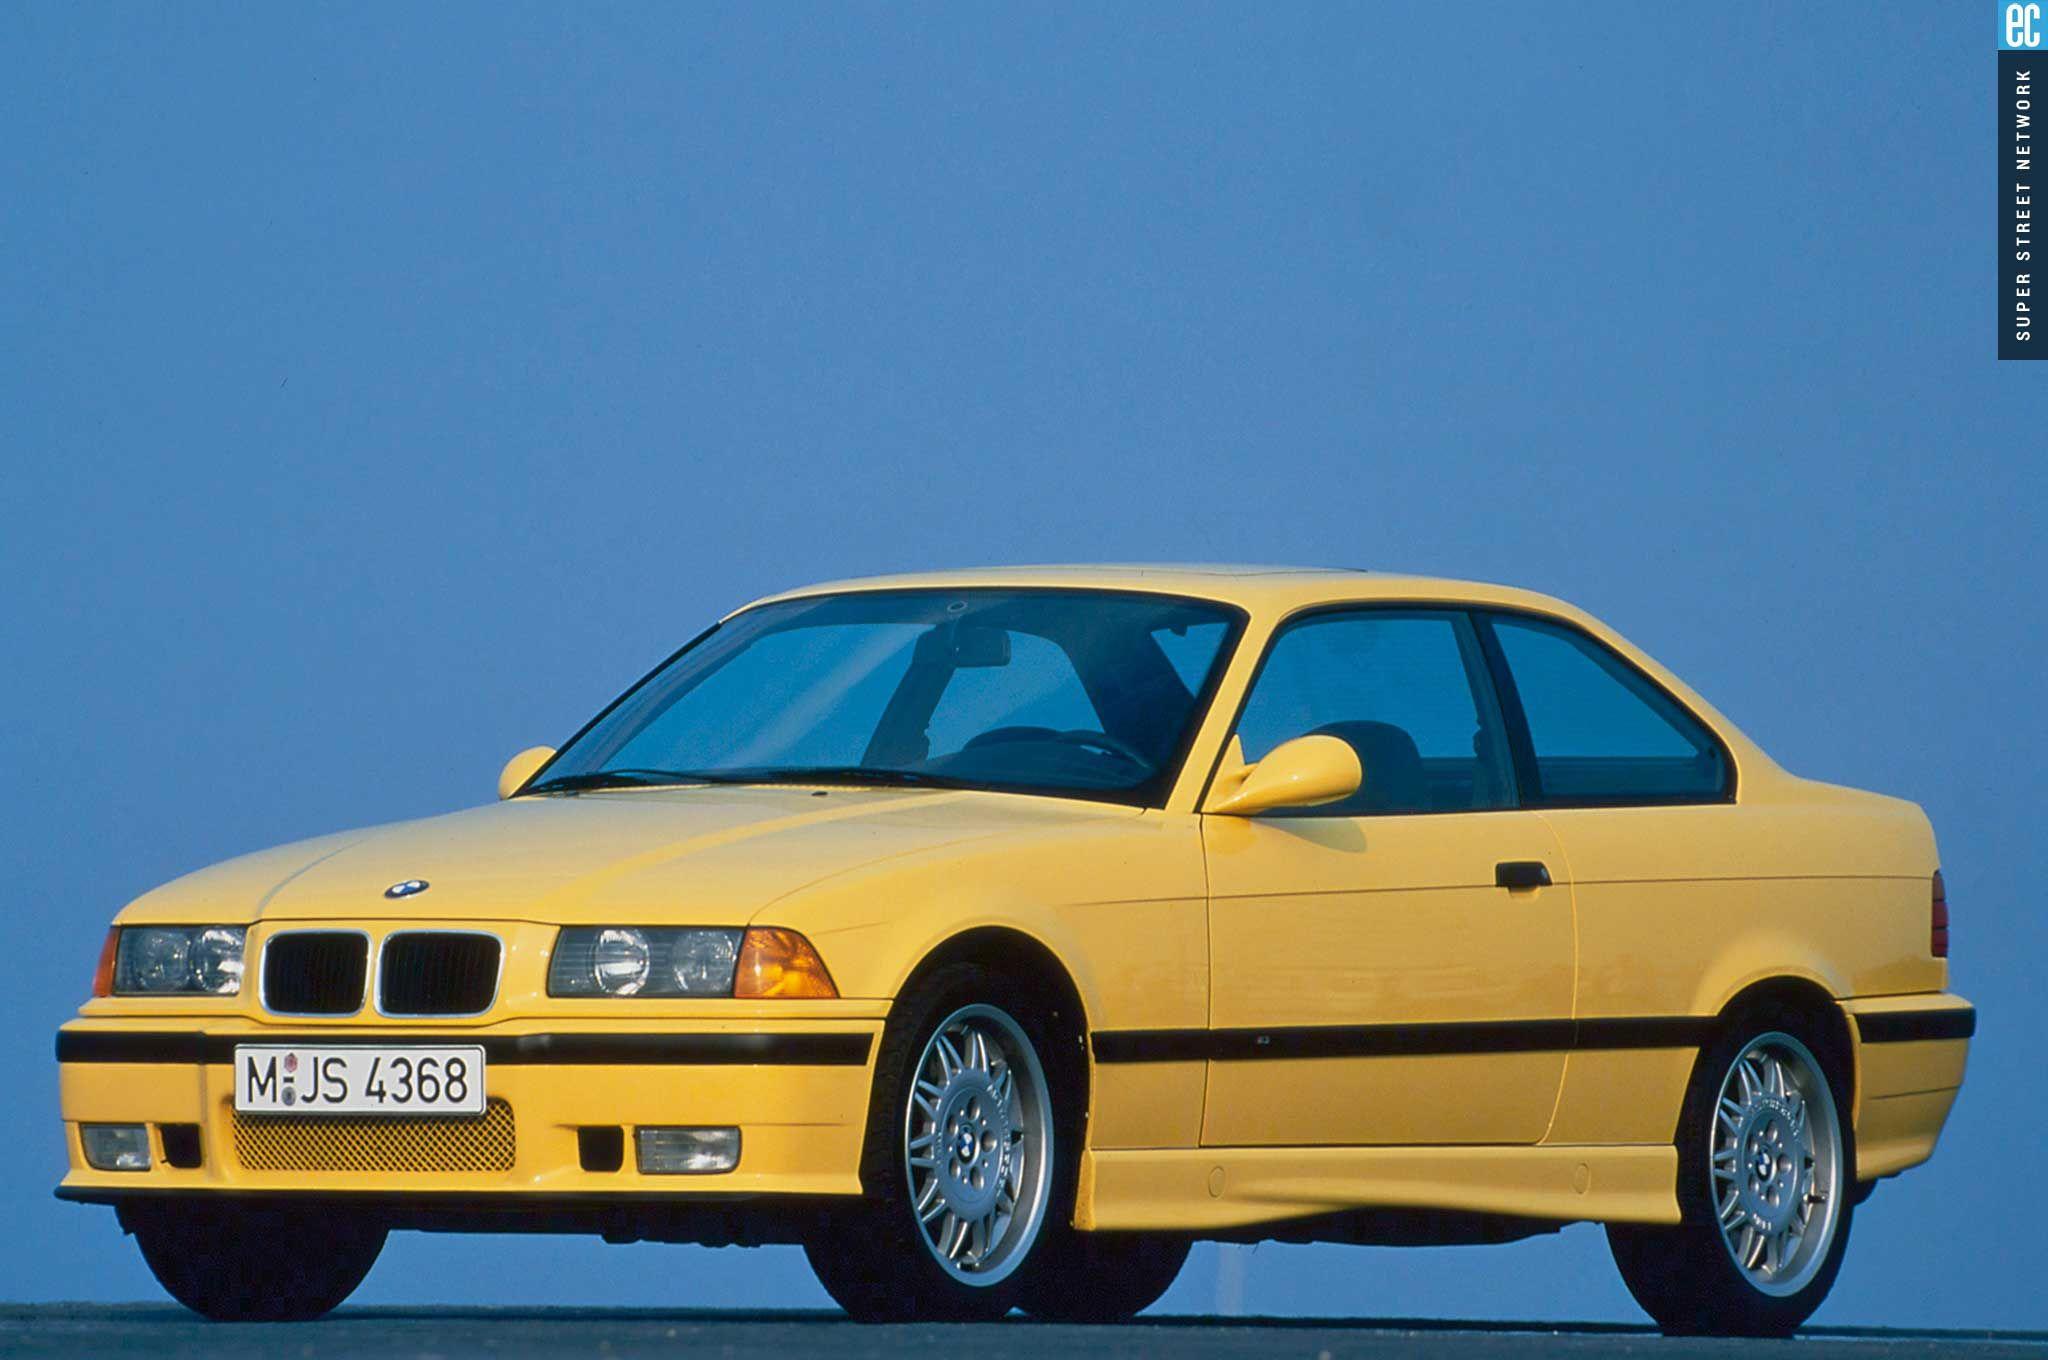 BMW M3 II (E36) 1992 - 1999 Sedan #8